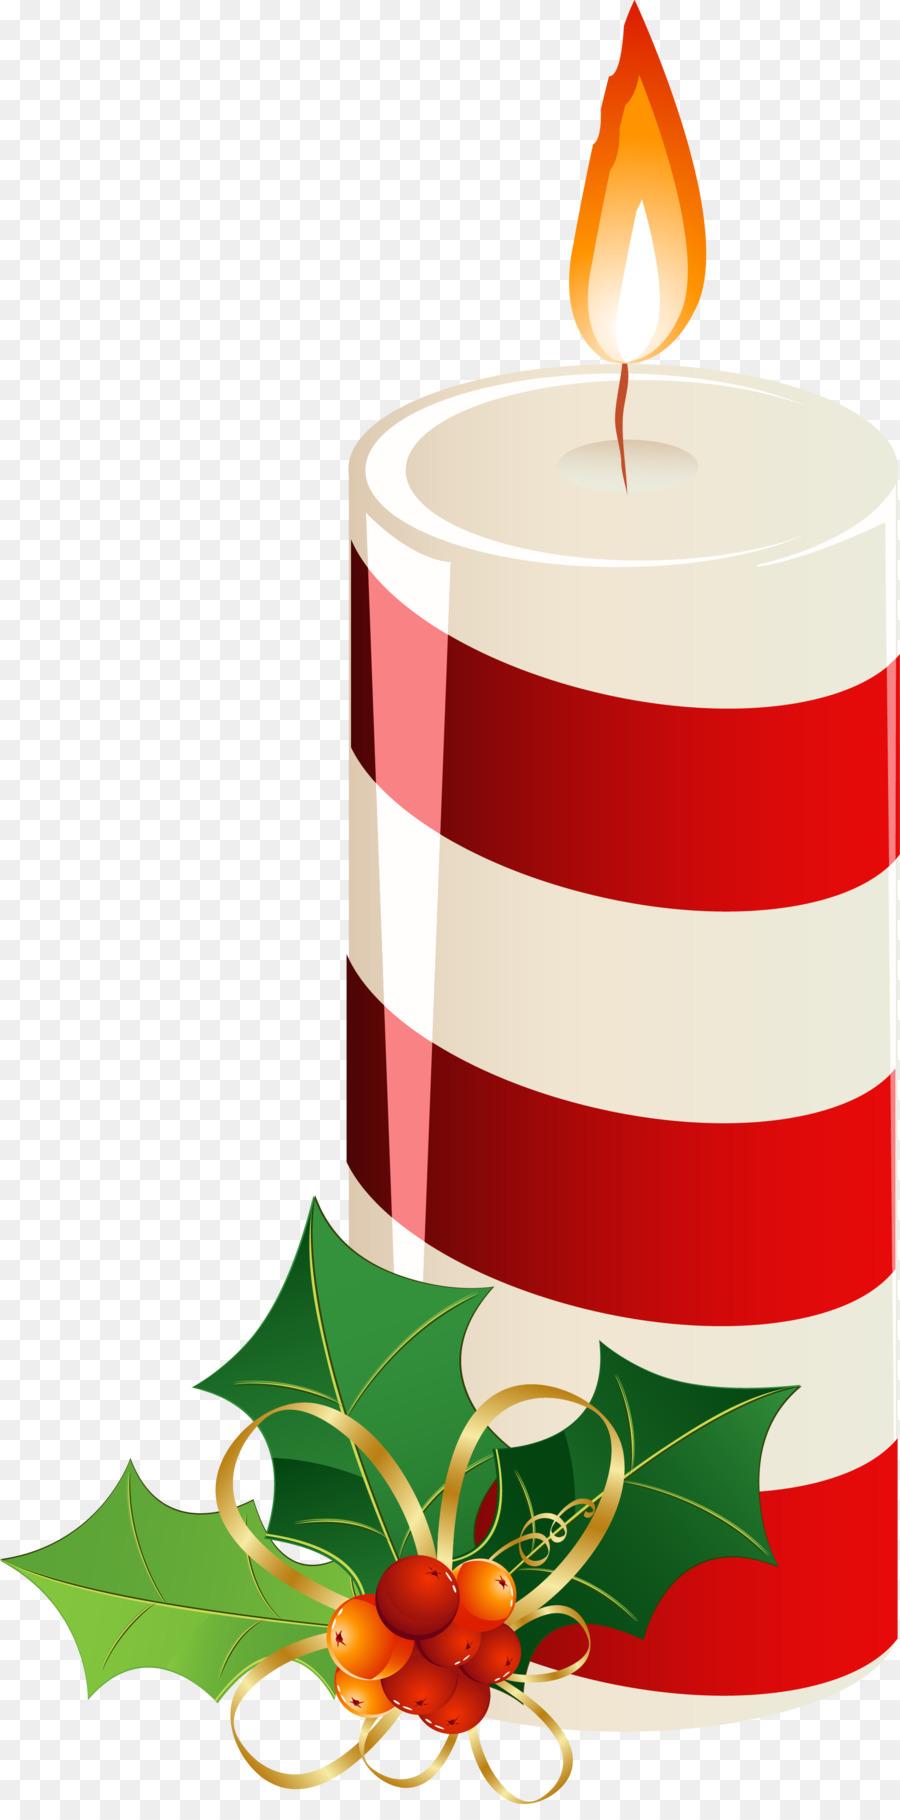 Christmas Decoration Border clipart.